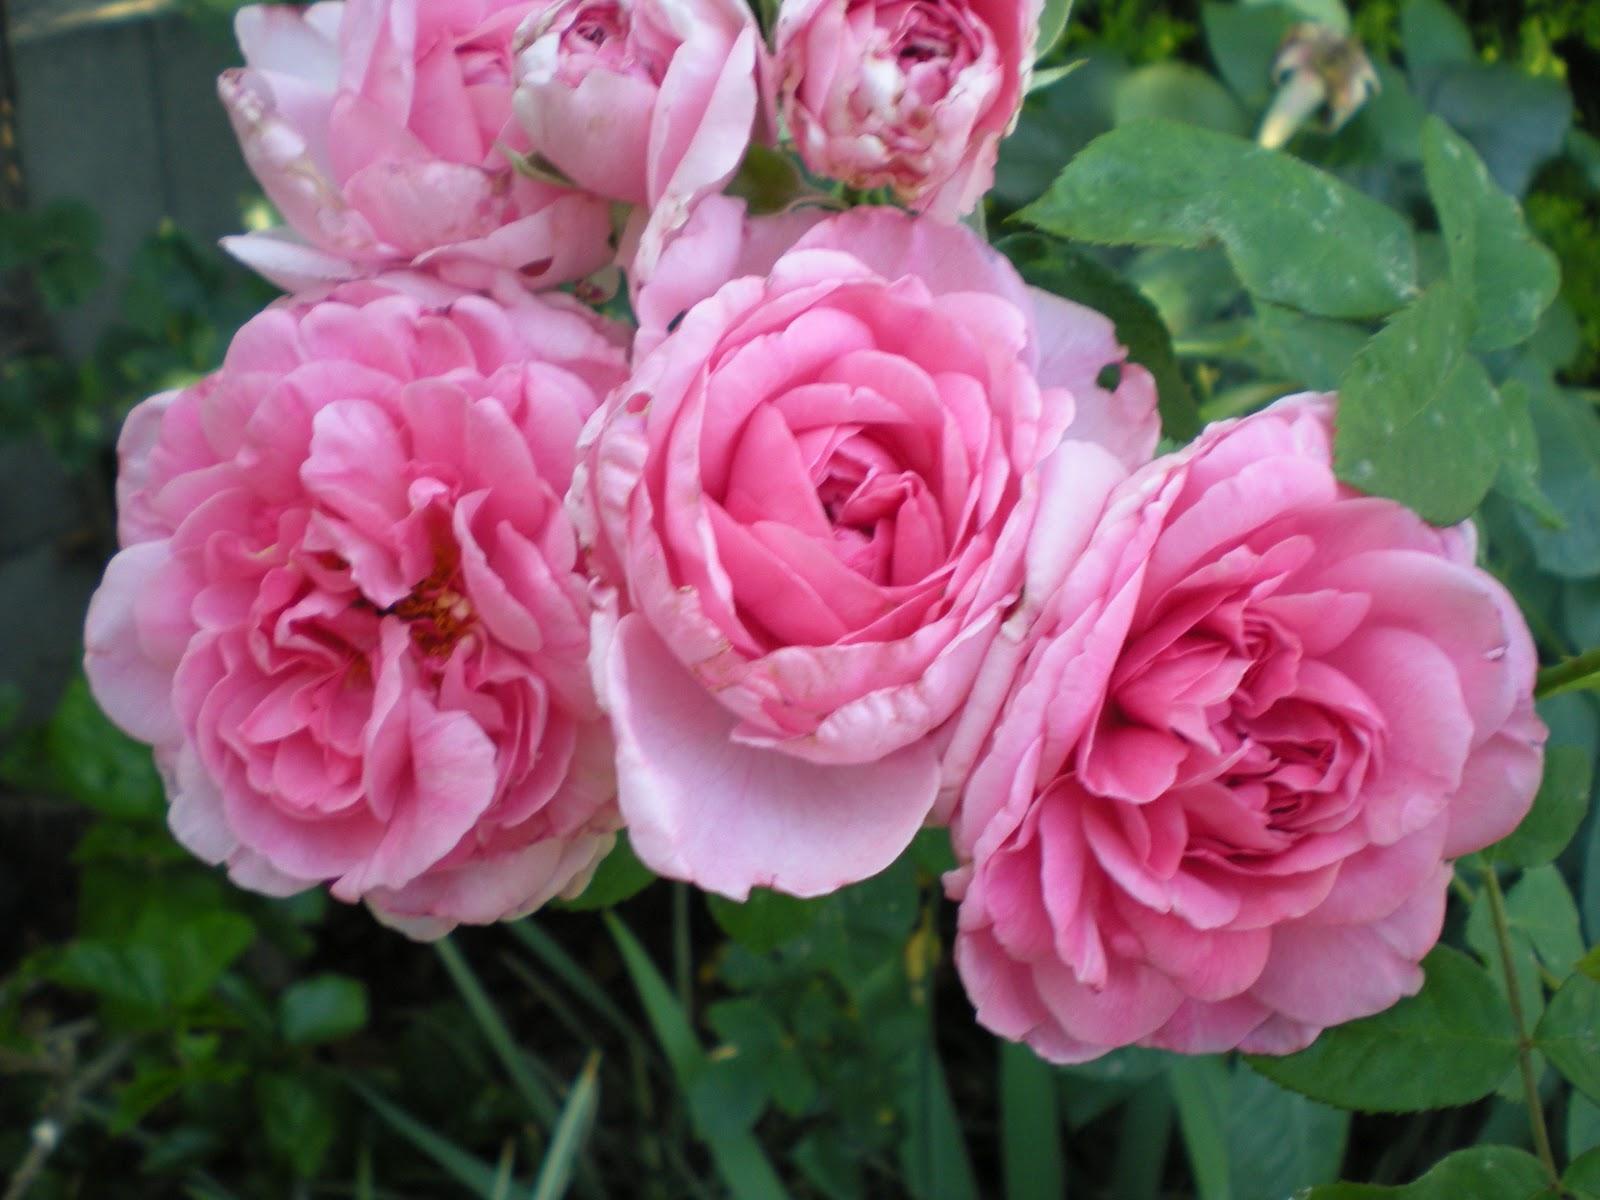 southern california gardening gertrude jekyll rose. Black Bedroom Furniture Sets. Home Design Ideas